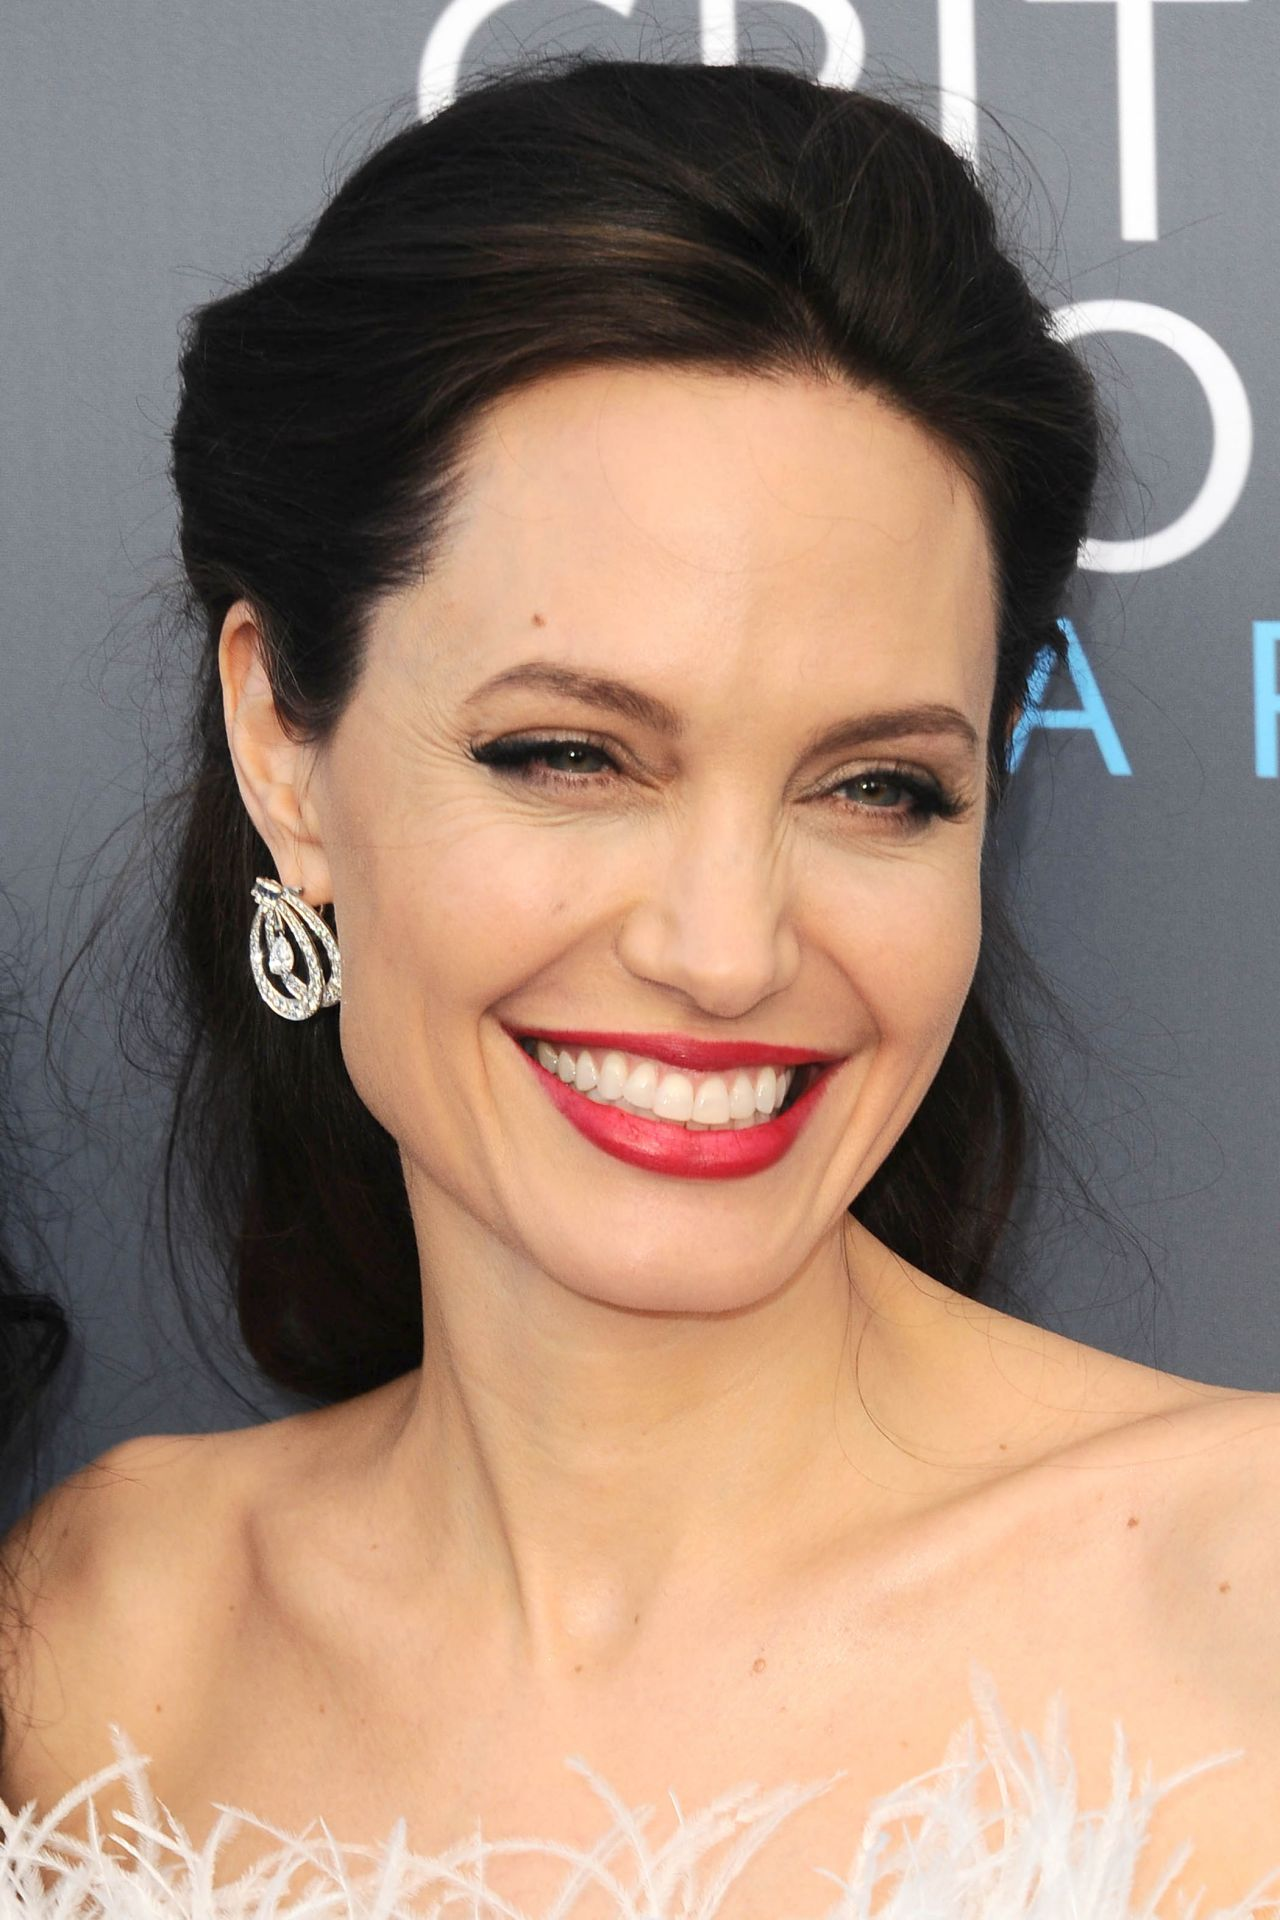 Angelina Jolie – 2018 Critics' Choice Awards Angelina Jolie